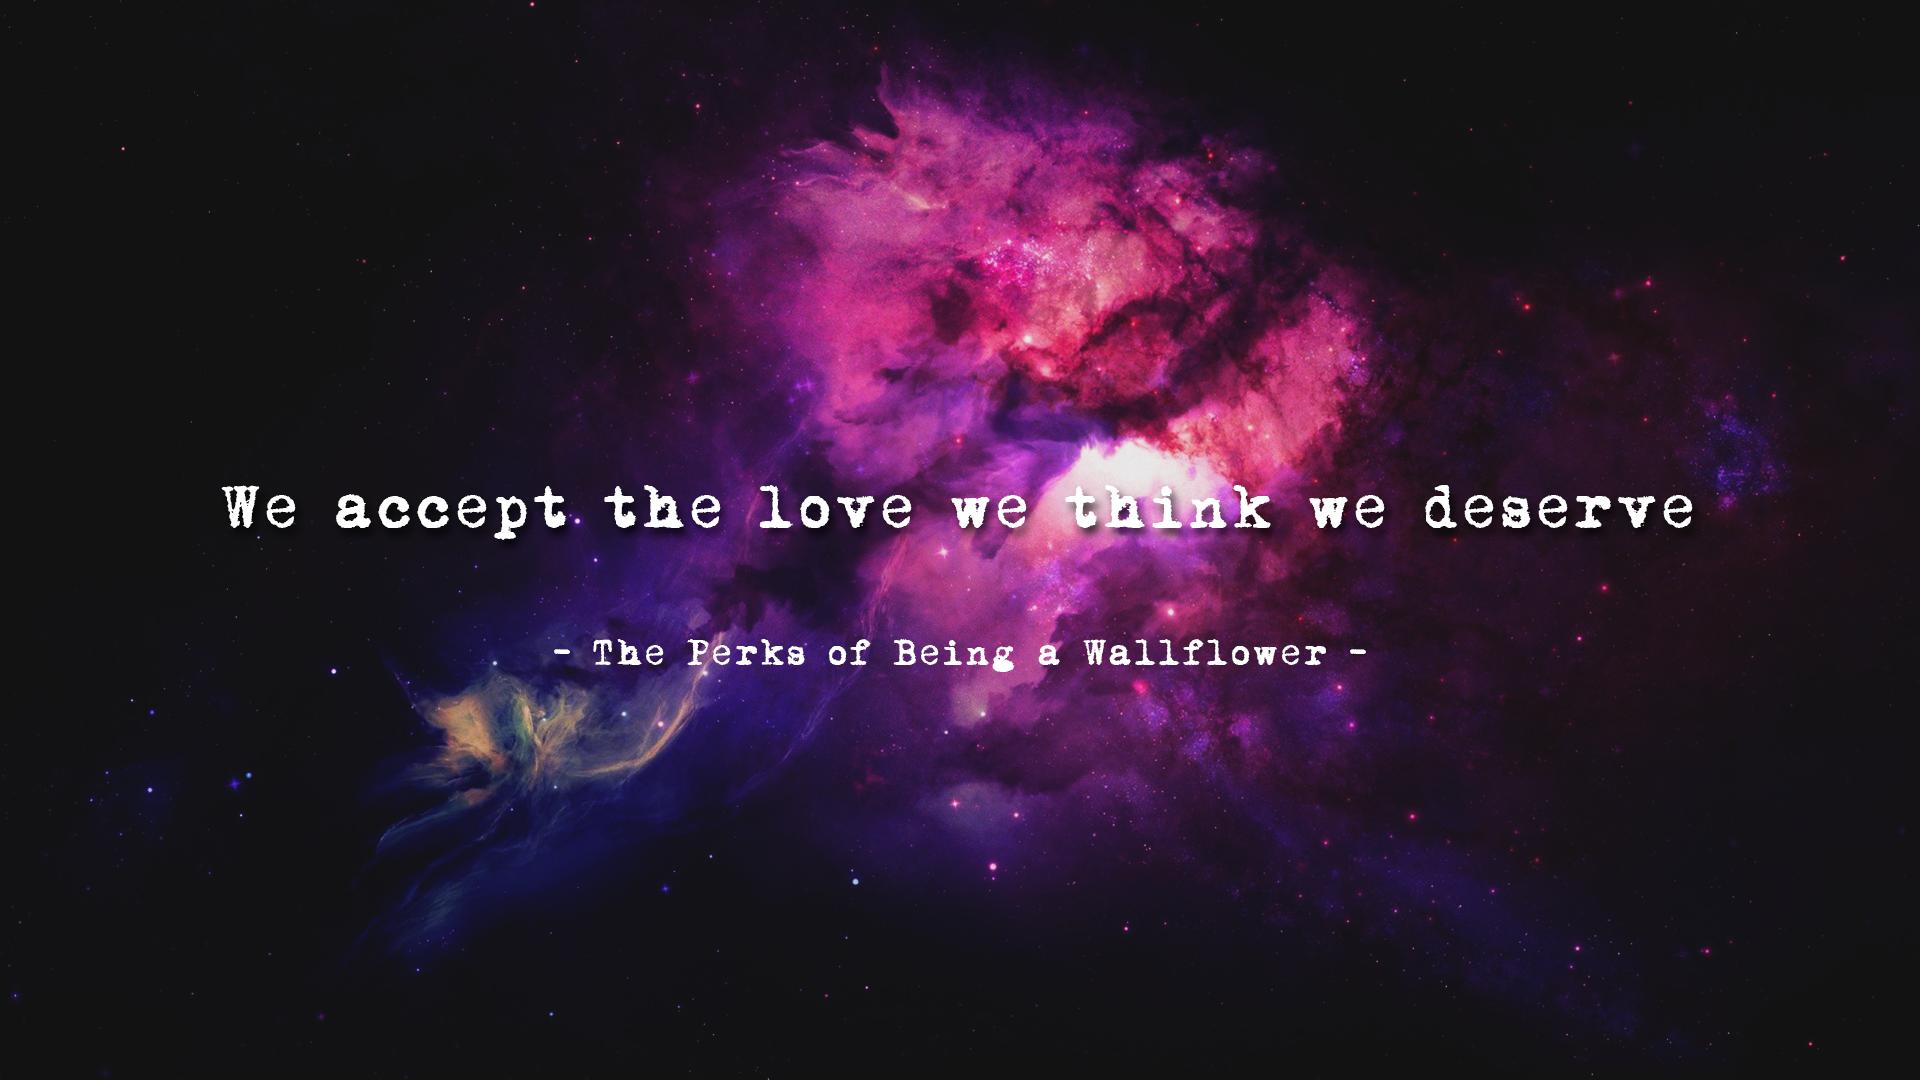 Wallpaper : quote, artwork, nebula, atmosphere, universe ...